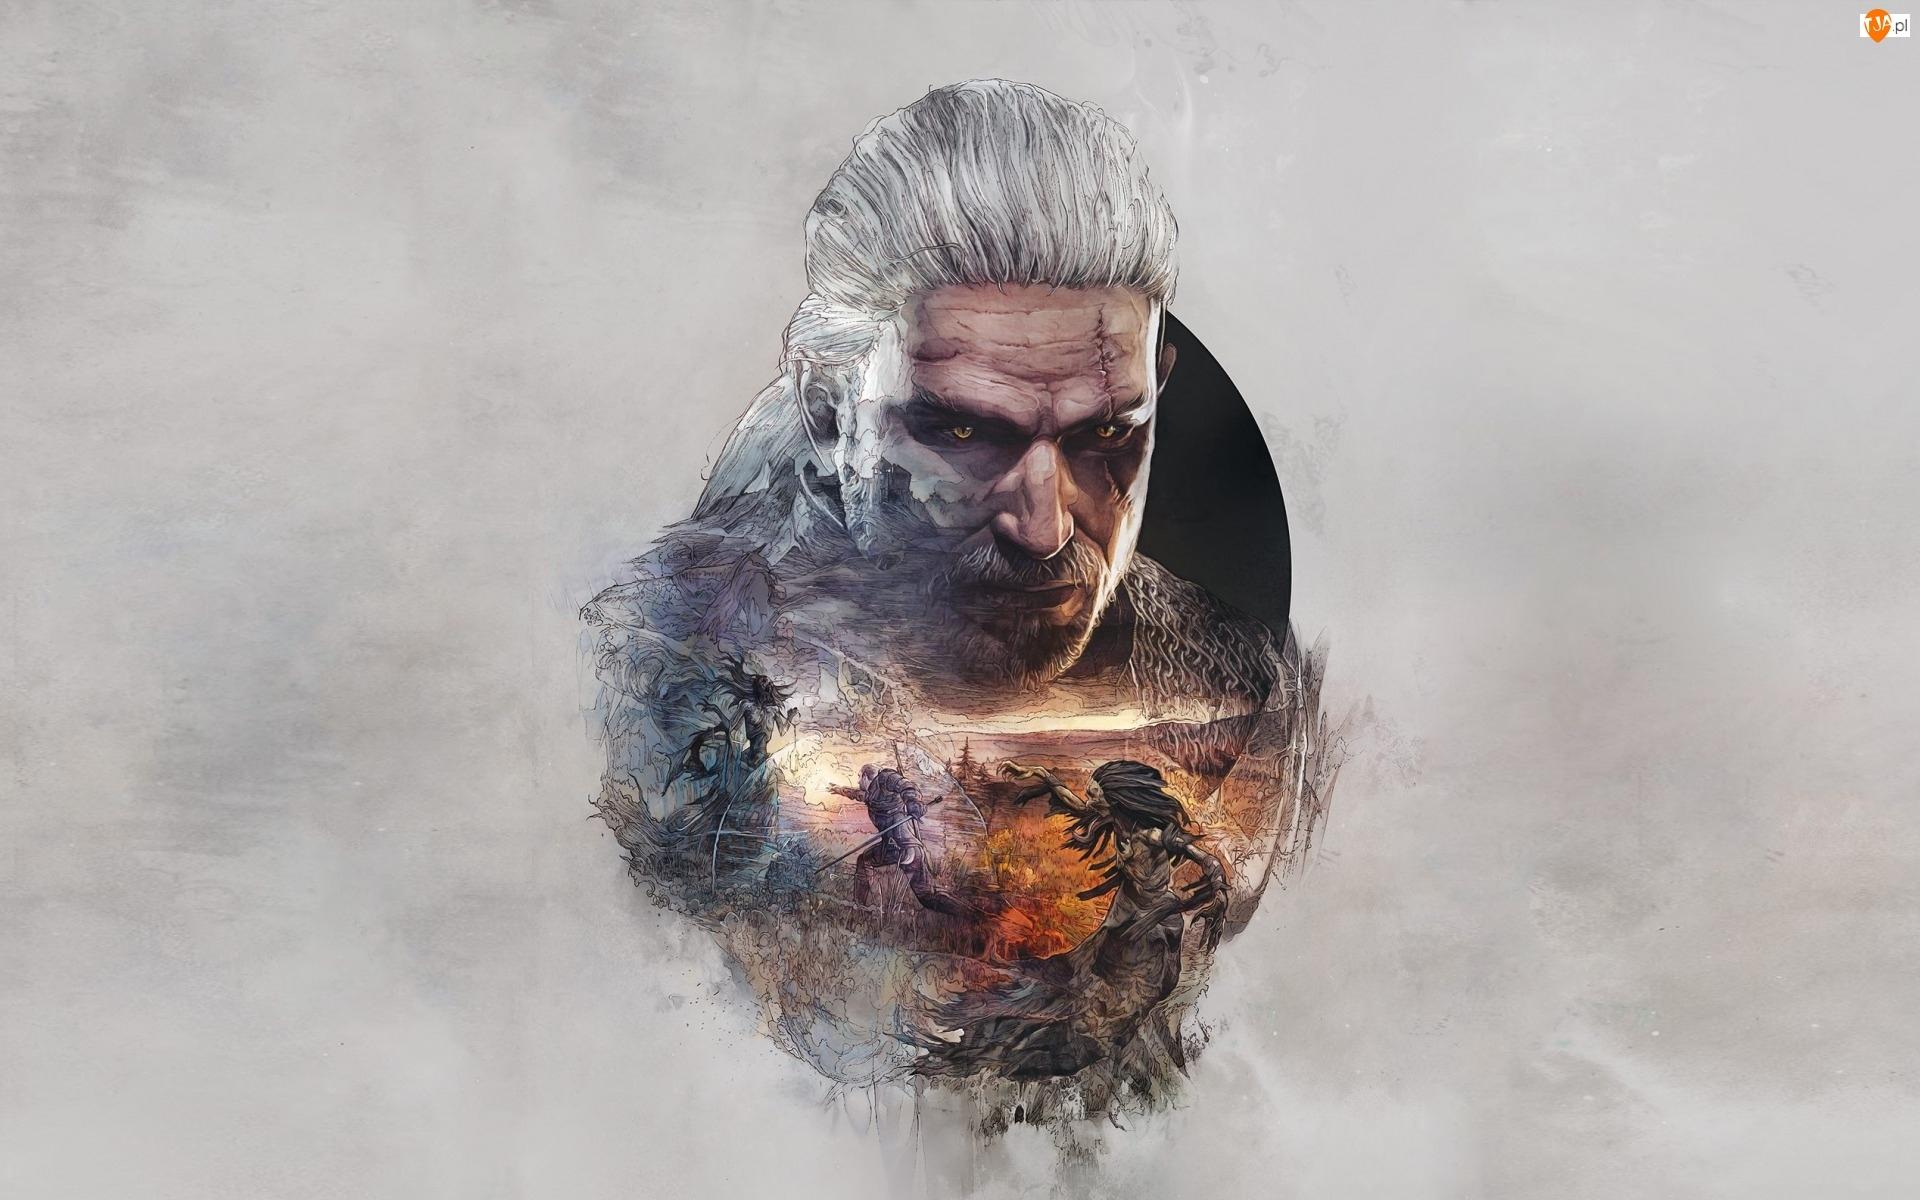 Wojownik, Geralt, Wiedżmin 3: Dziki Gon